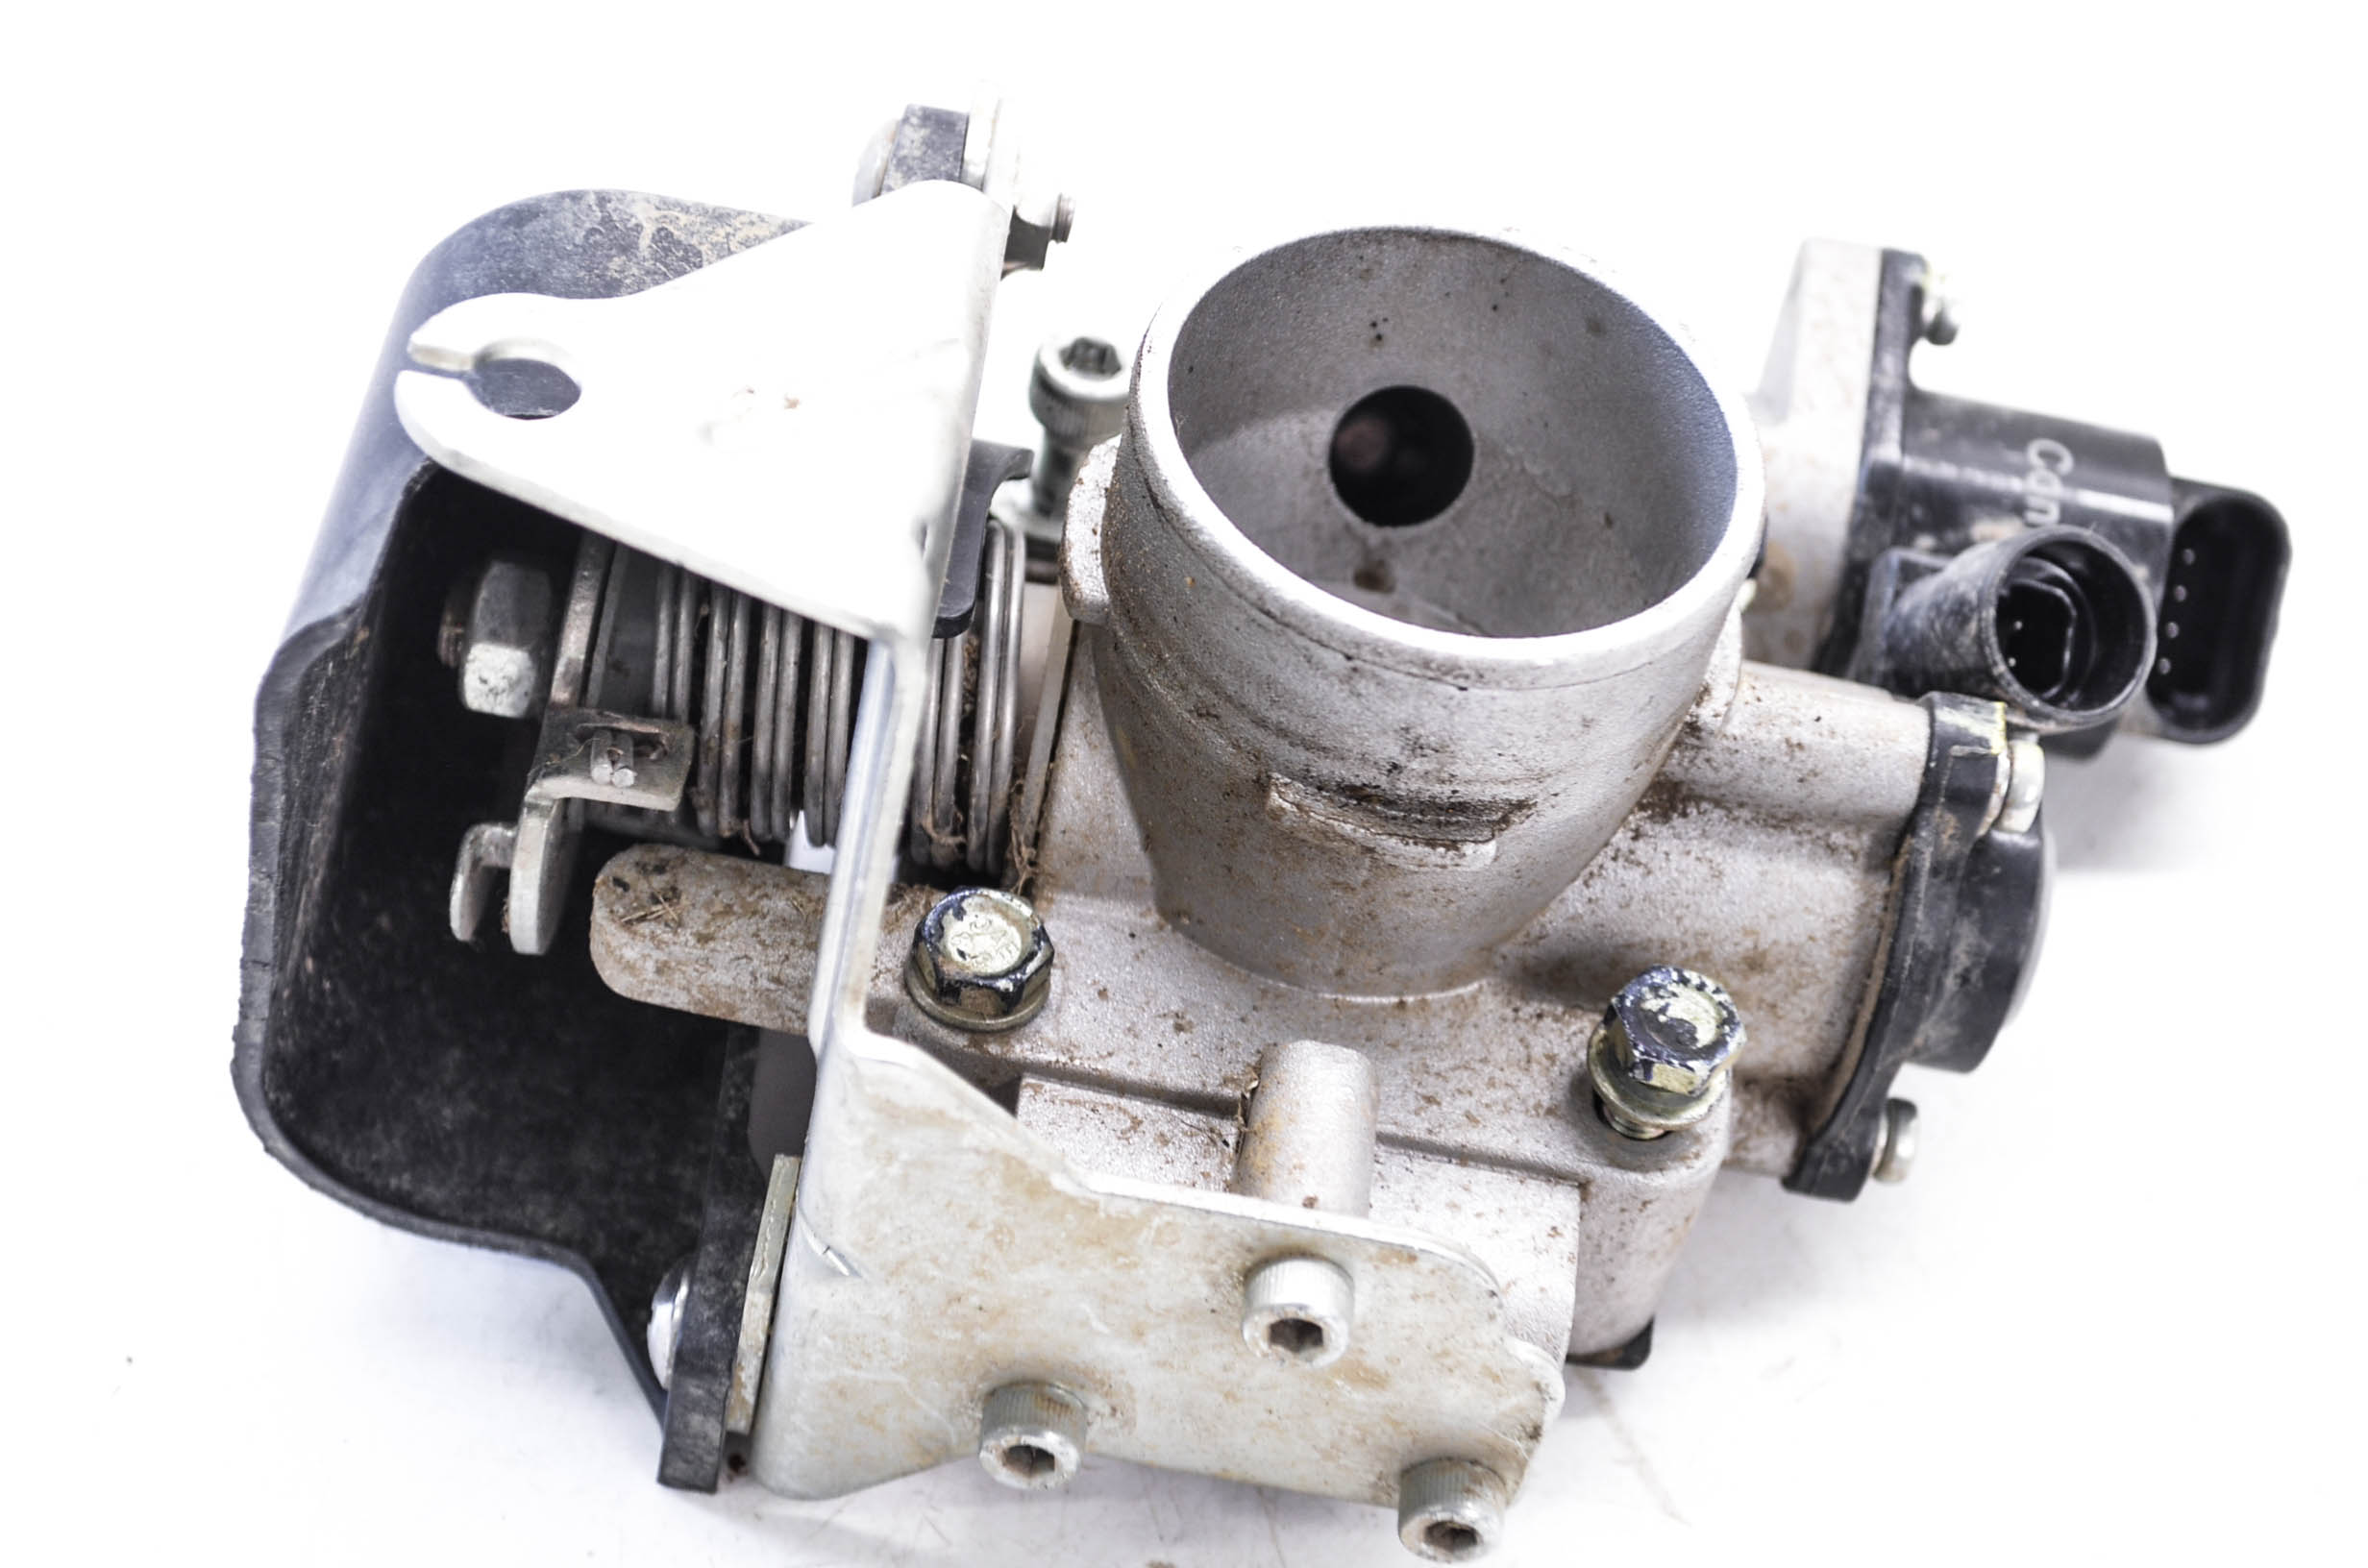 Details about 15 Kawasaki Mule Pro FXT 4x4 Throttle Body KAF820